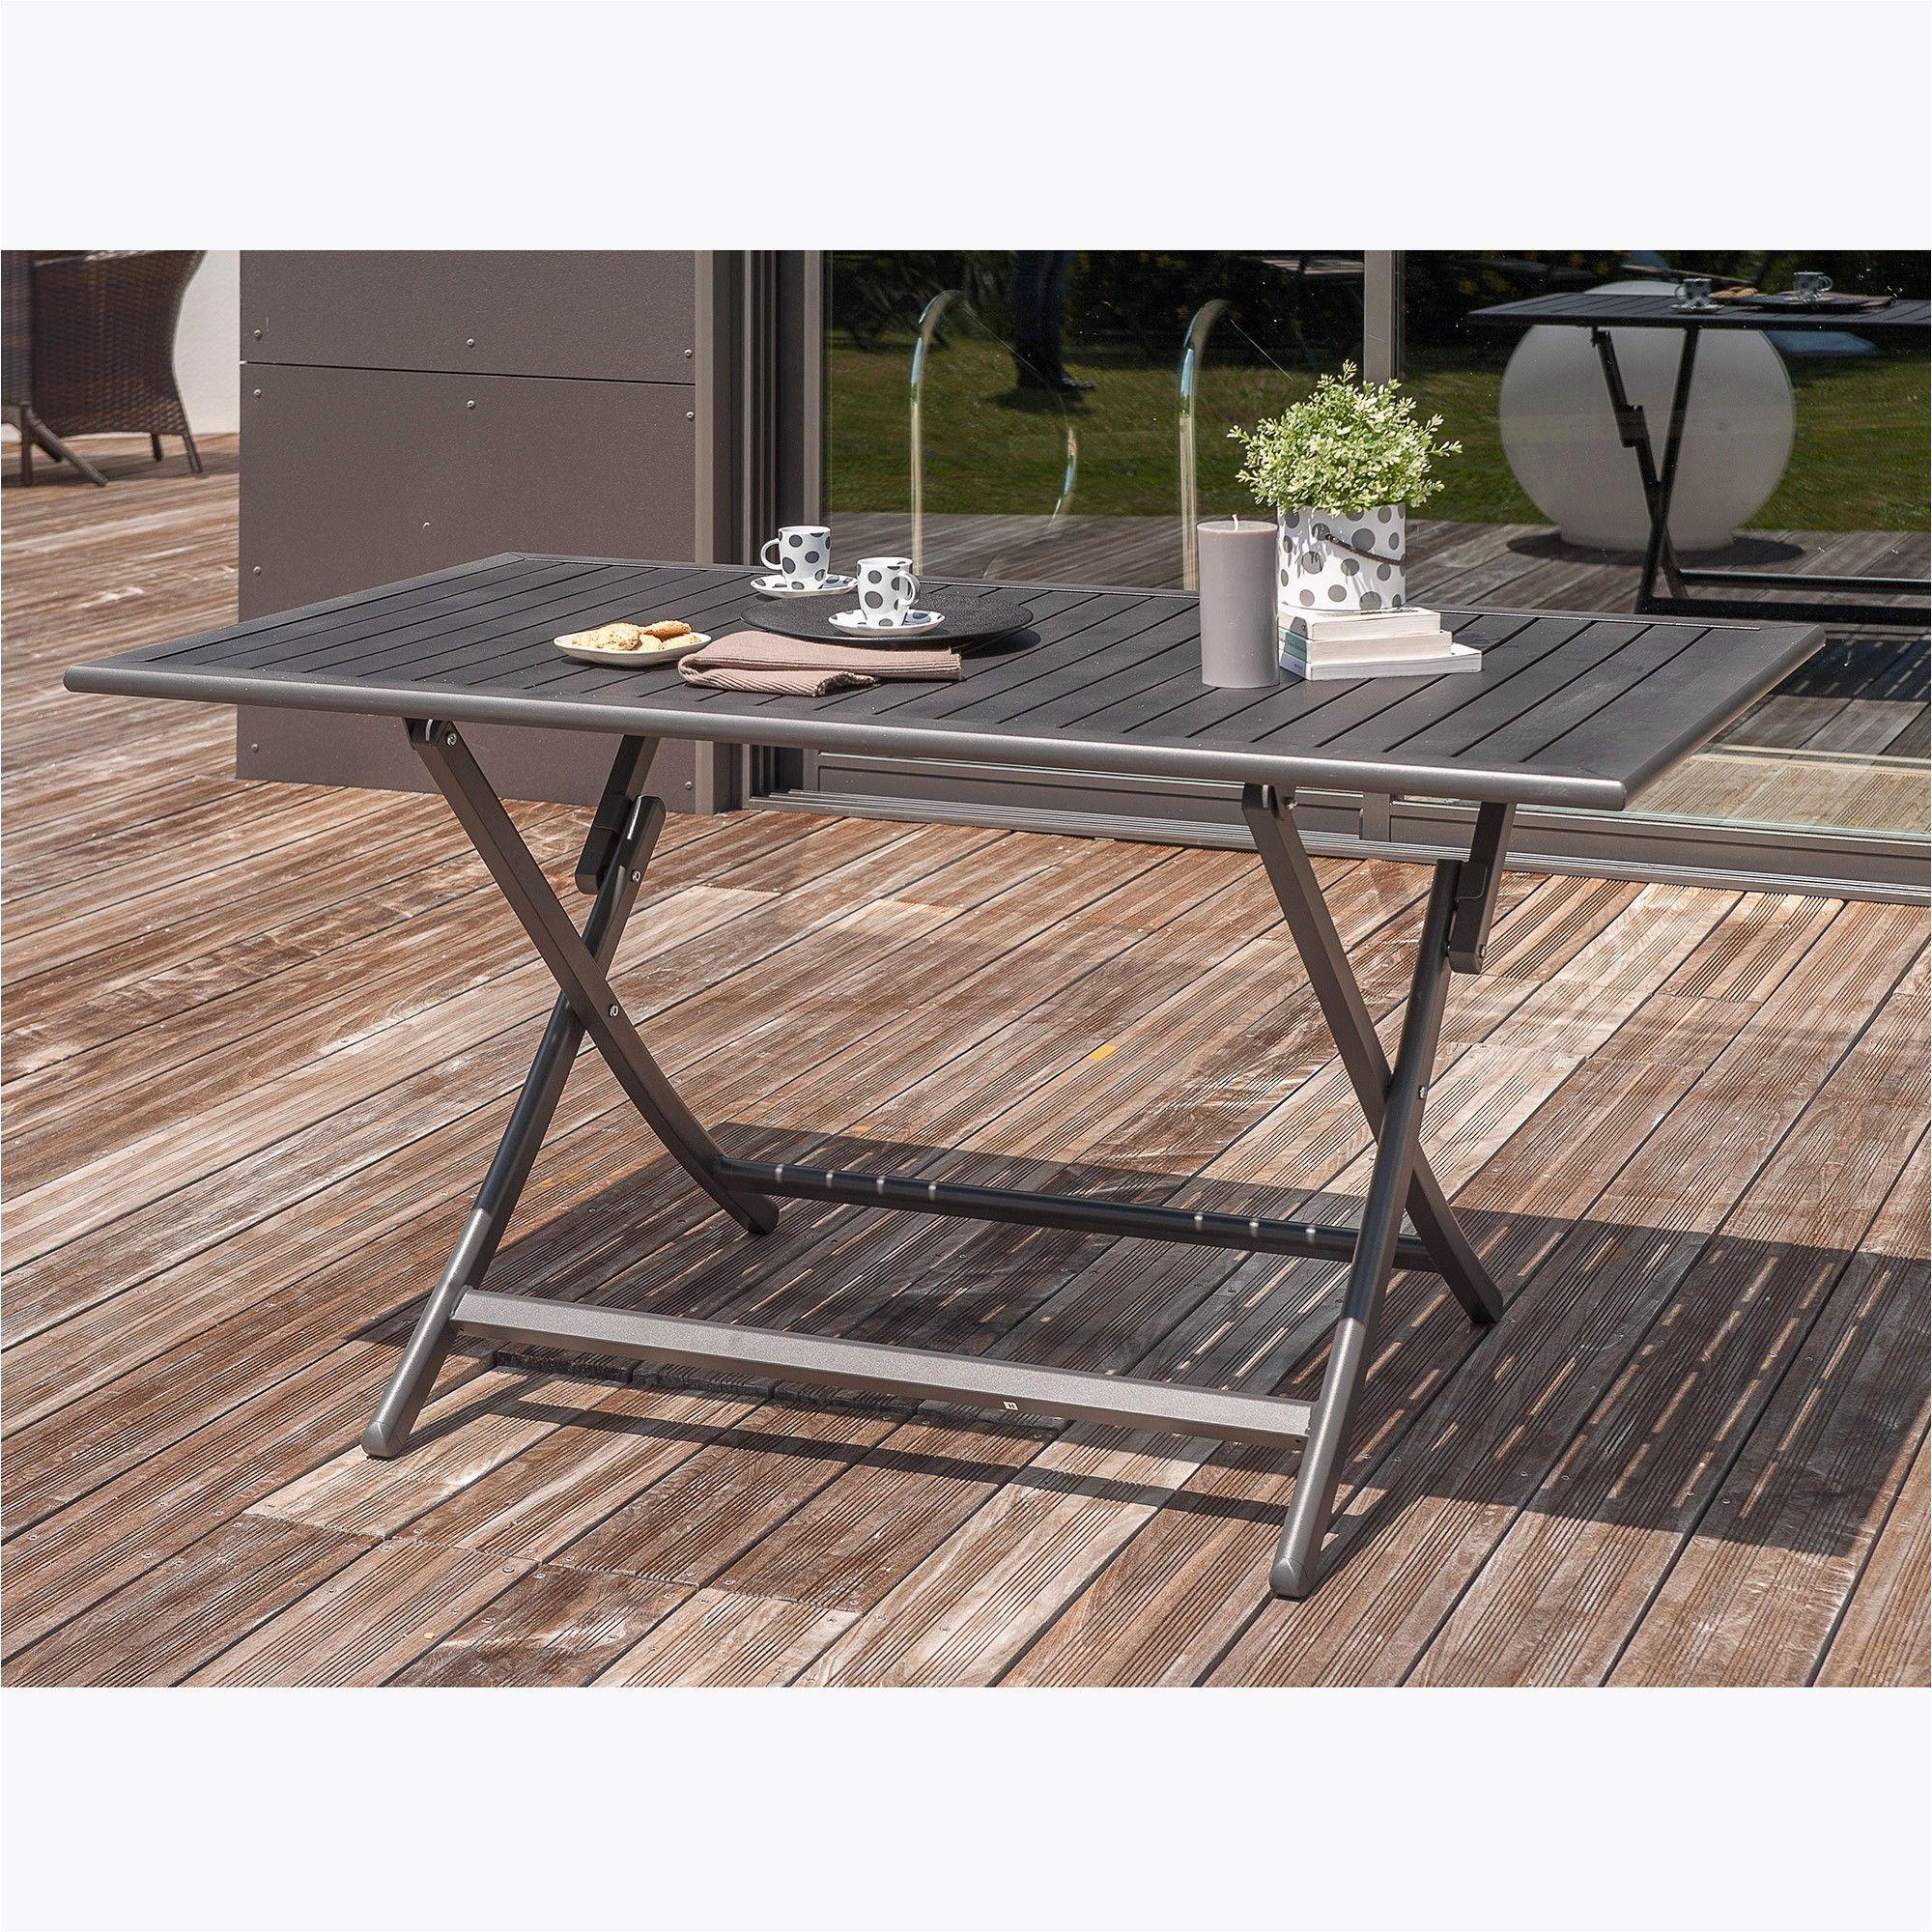 Table De Jardin Bois Pliante Beau Table Pliante Leclerc Beau S Leclerc Table De Jardin